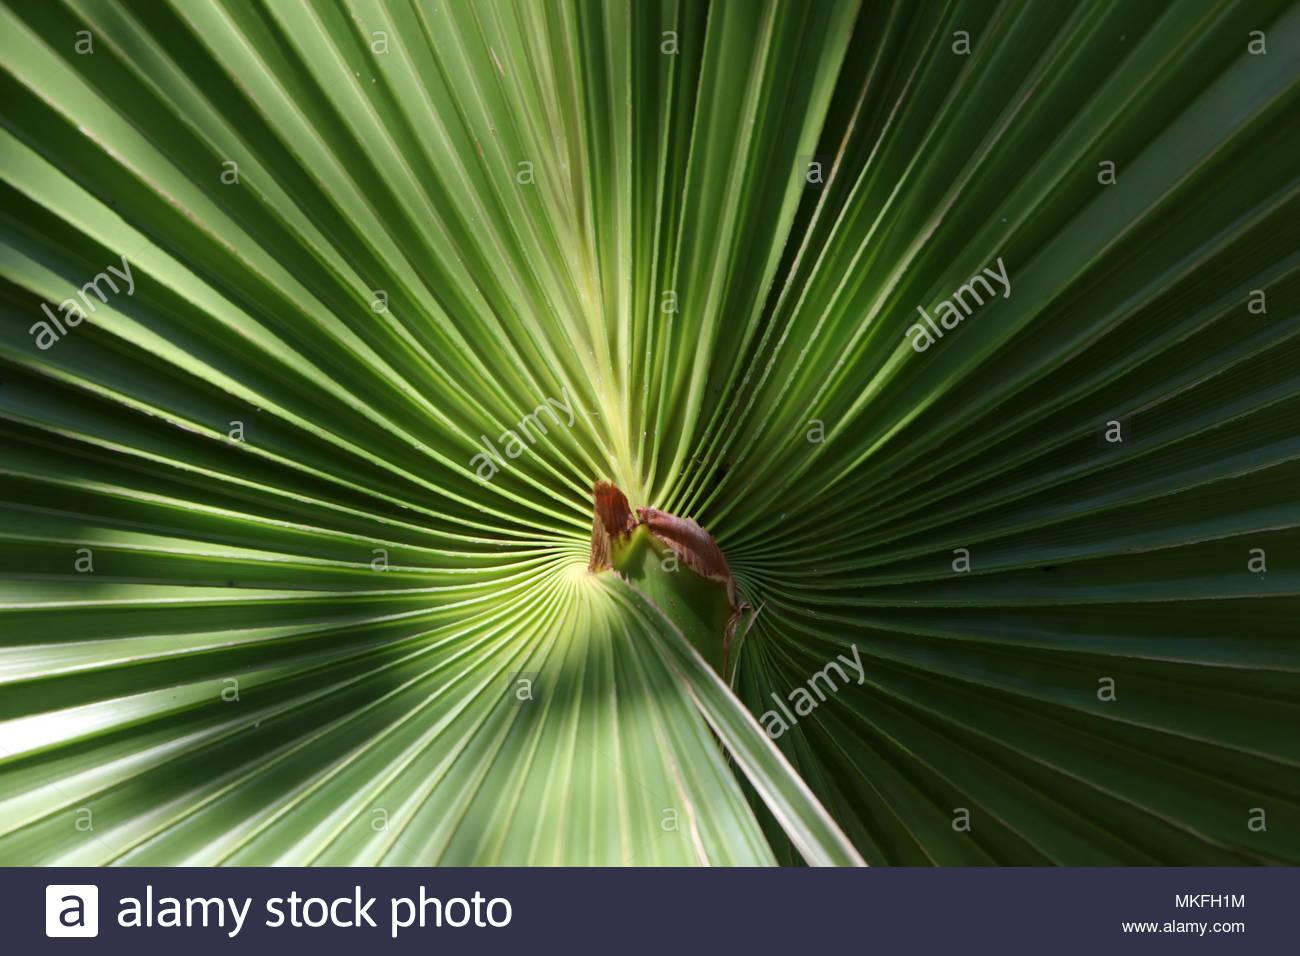 Varadero, Cuba - Close-up of a Cuban palm leaf in Varadero, Cuba. - Stock Image